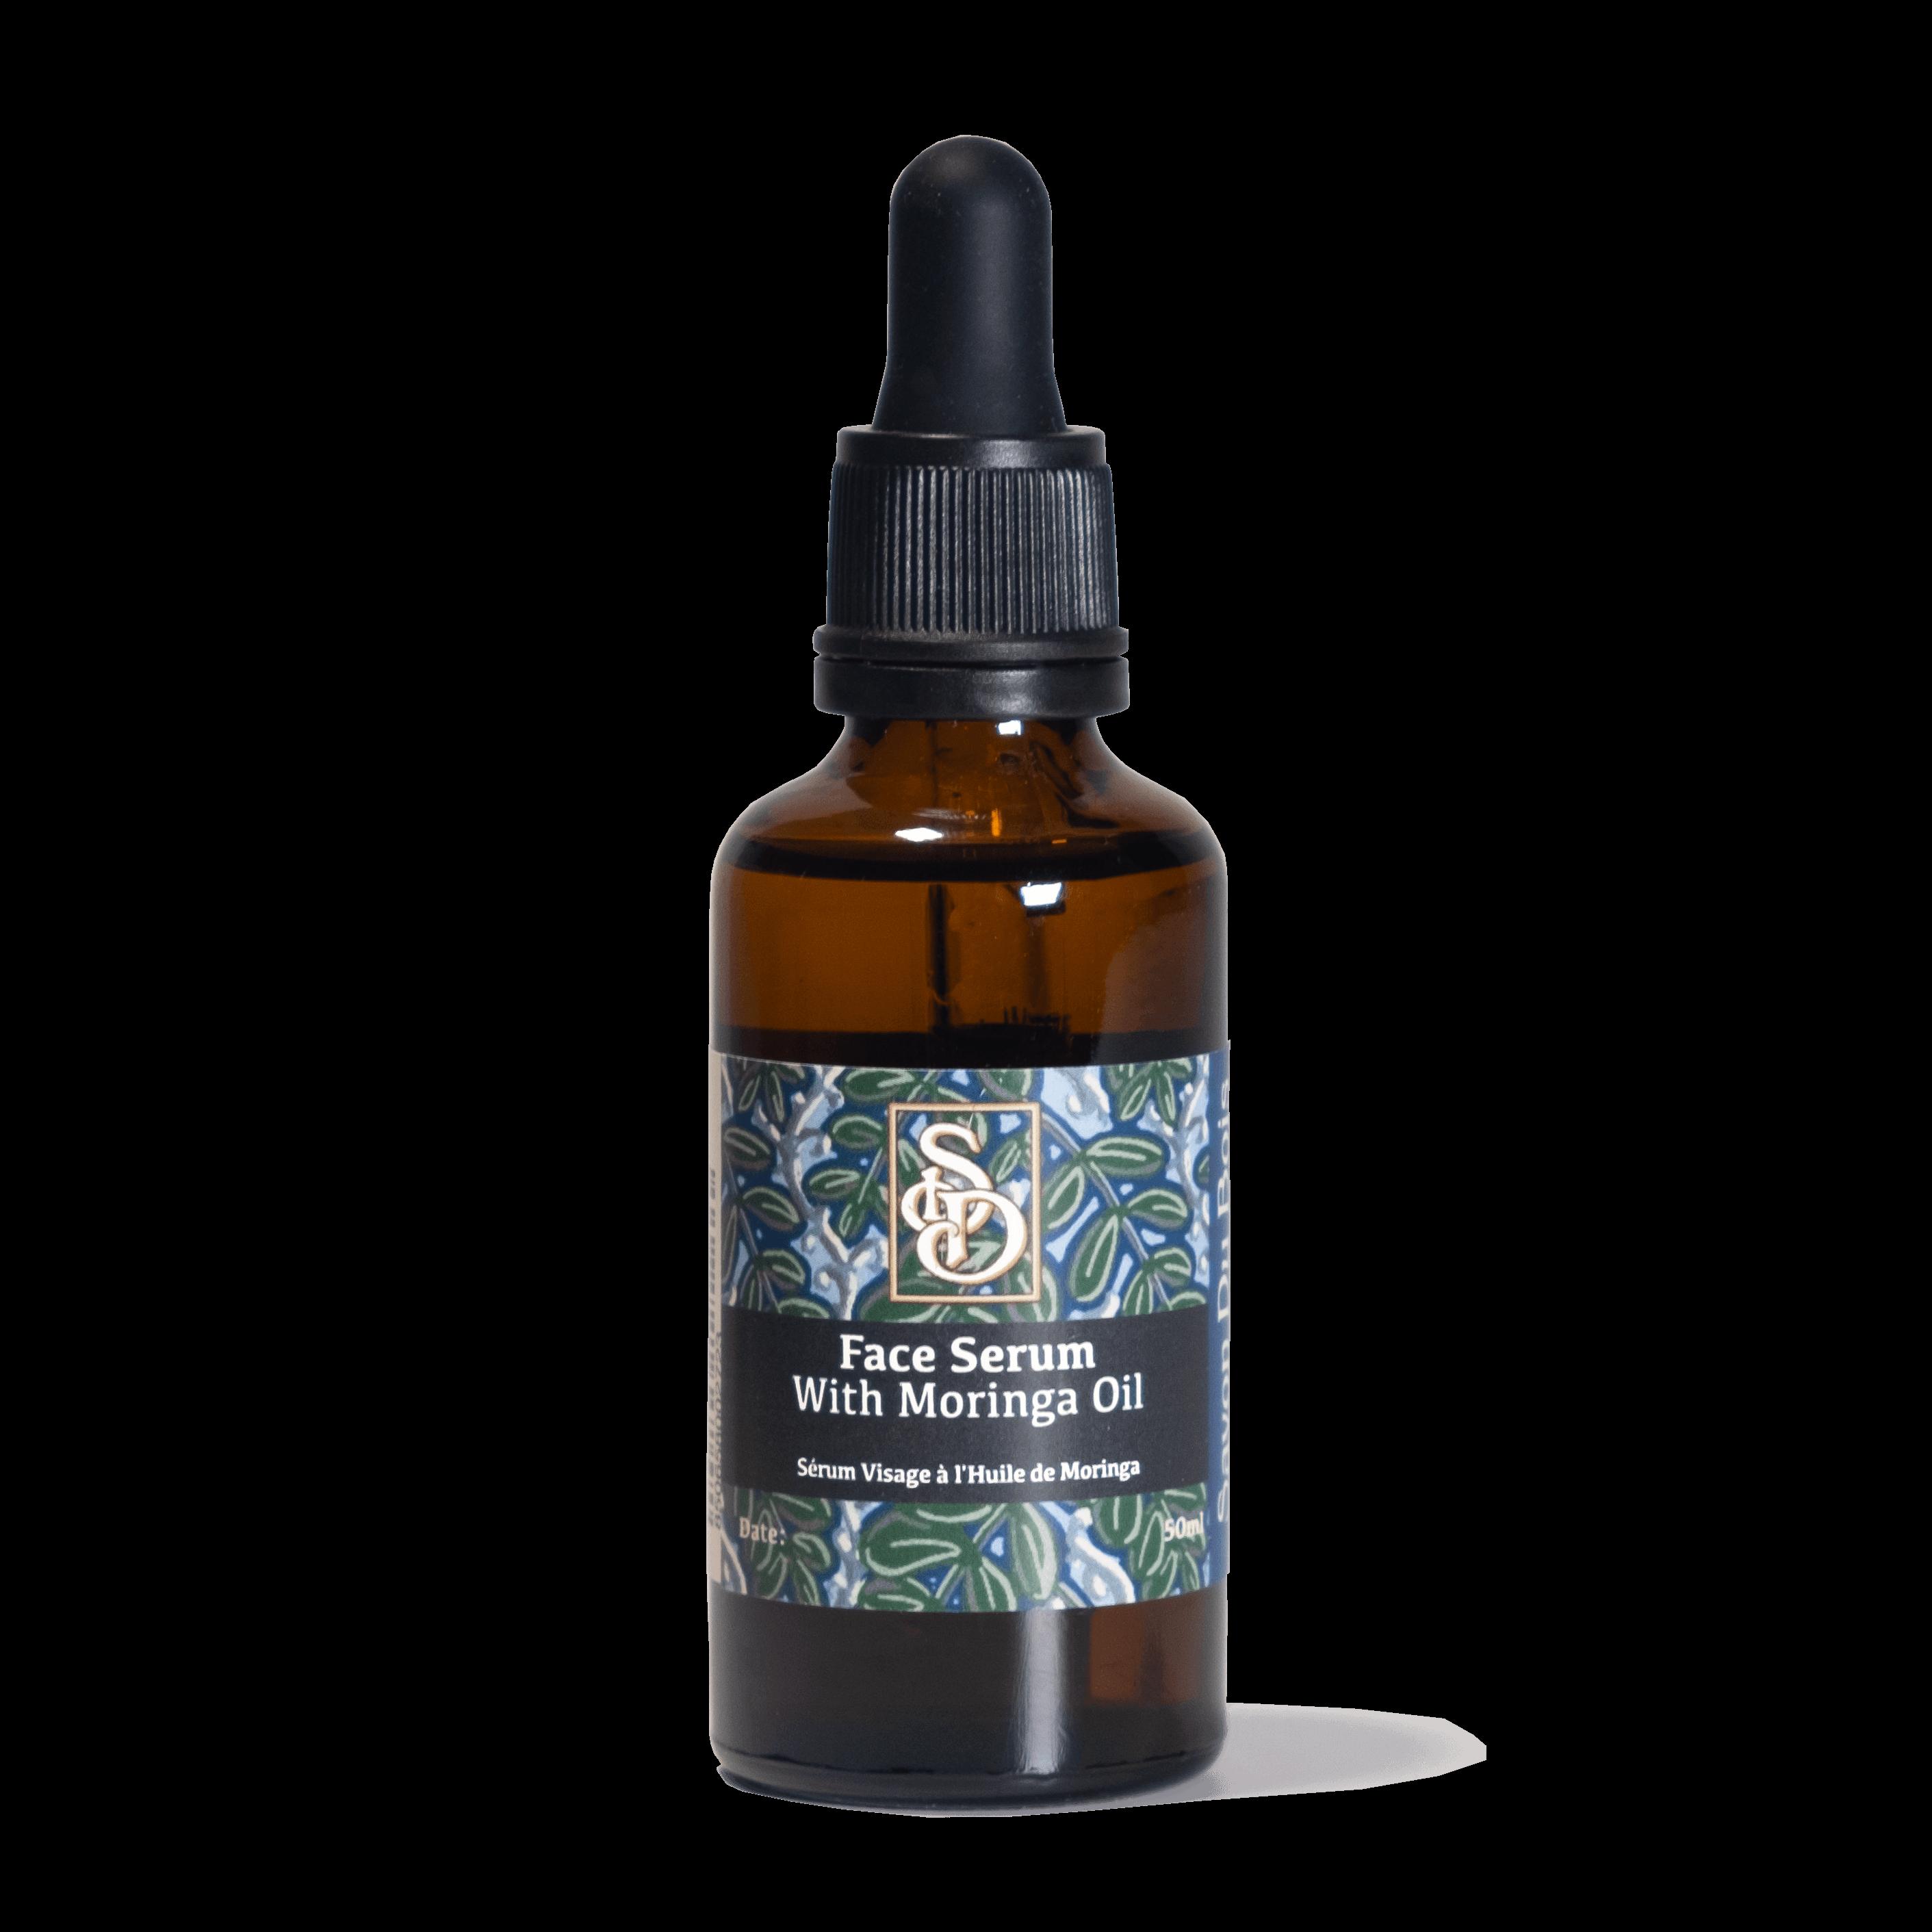 Face Serum | Moringa Oil